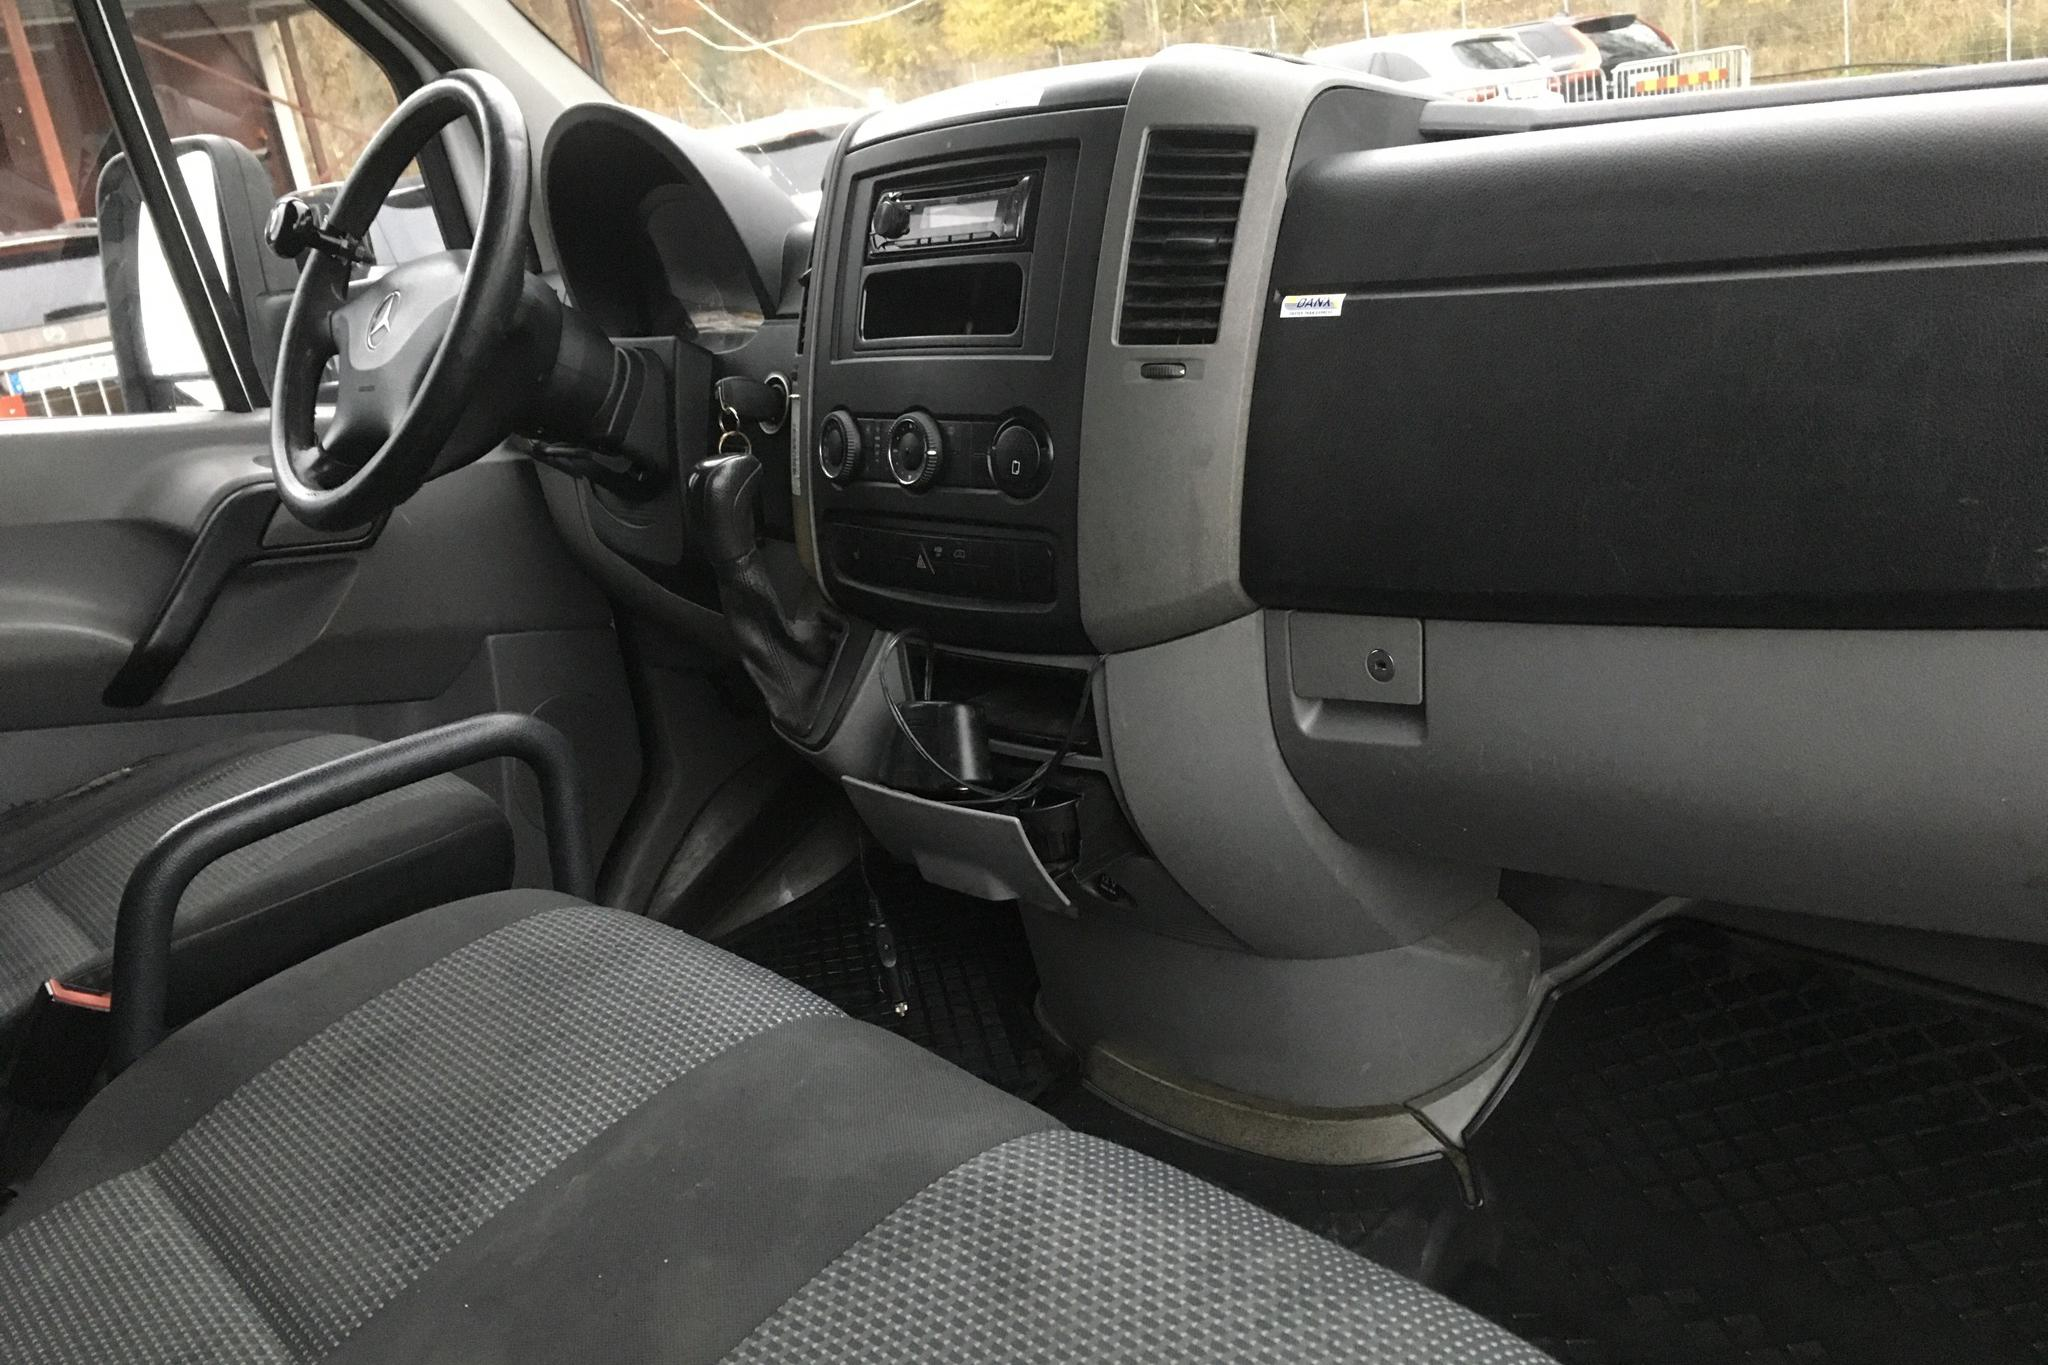 Mercedes Sprinter 319 CDI Pickup/Chassi (190hk) - 491 580 km - Automatic - white - 2011